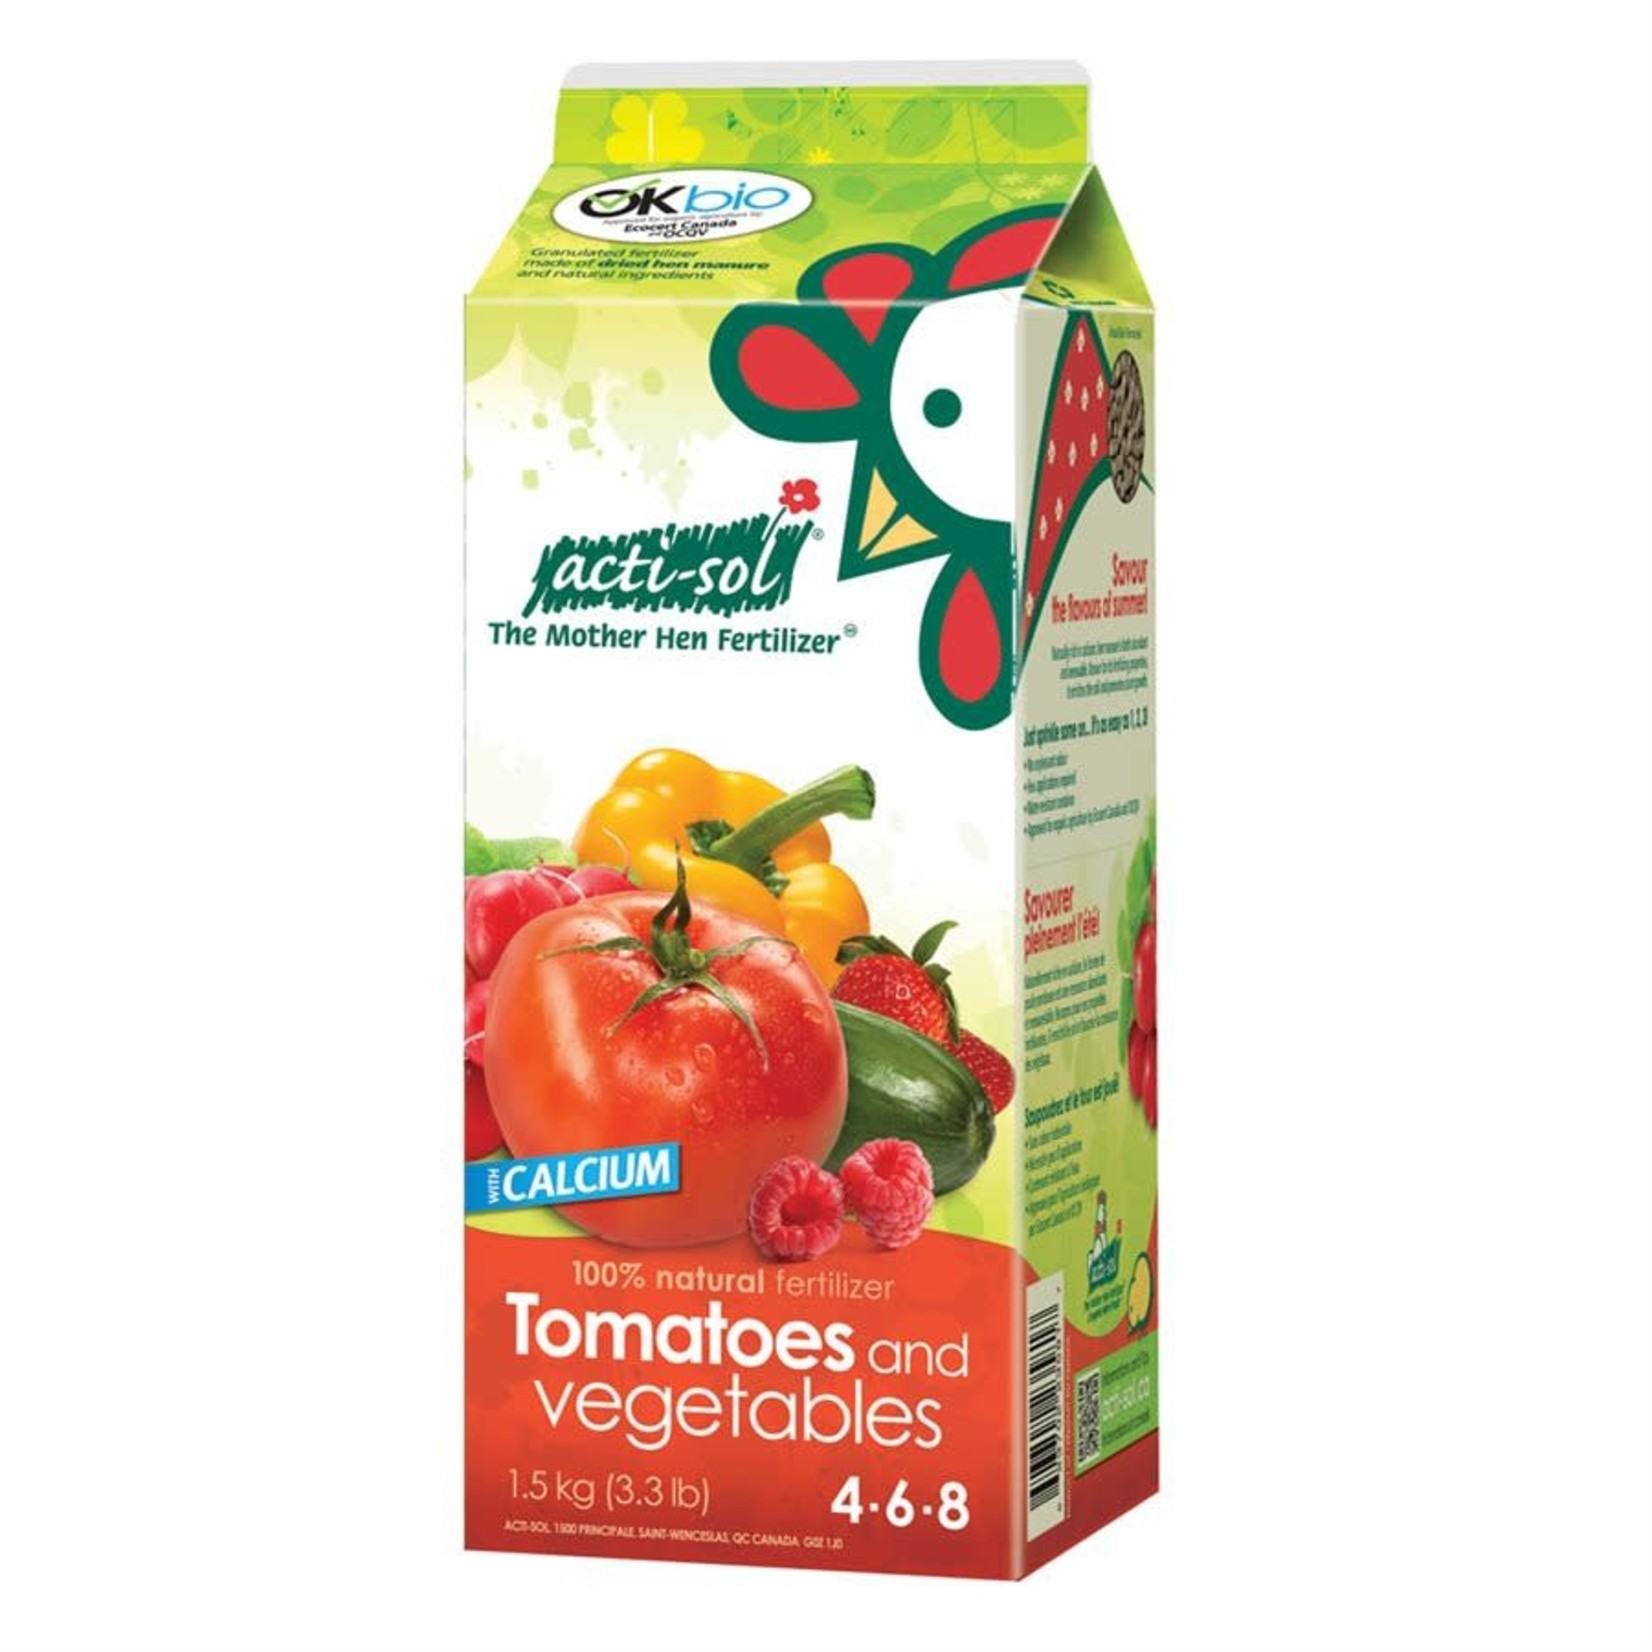 Acti-Sol Tomatoes & Vegetables 4-6-8 1.5kg